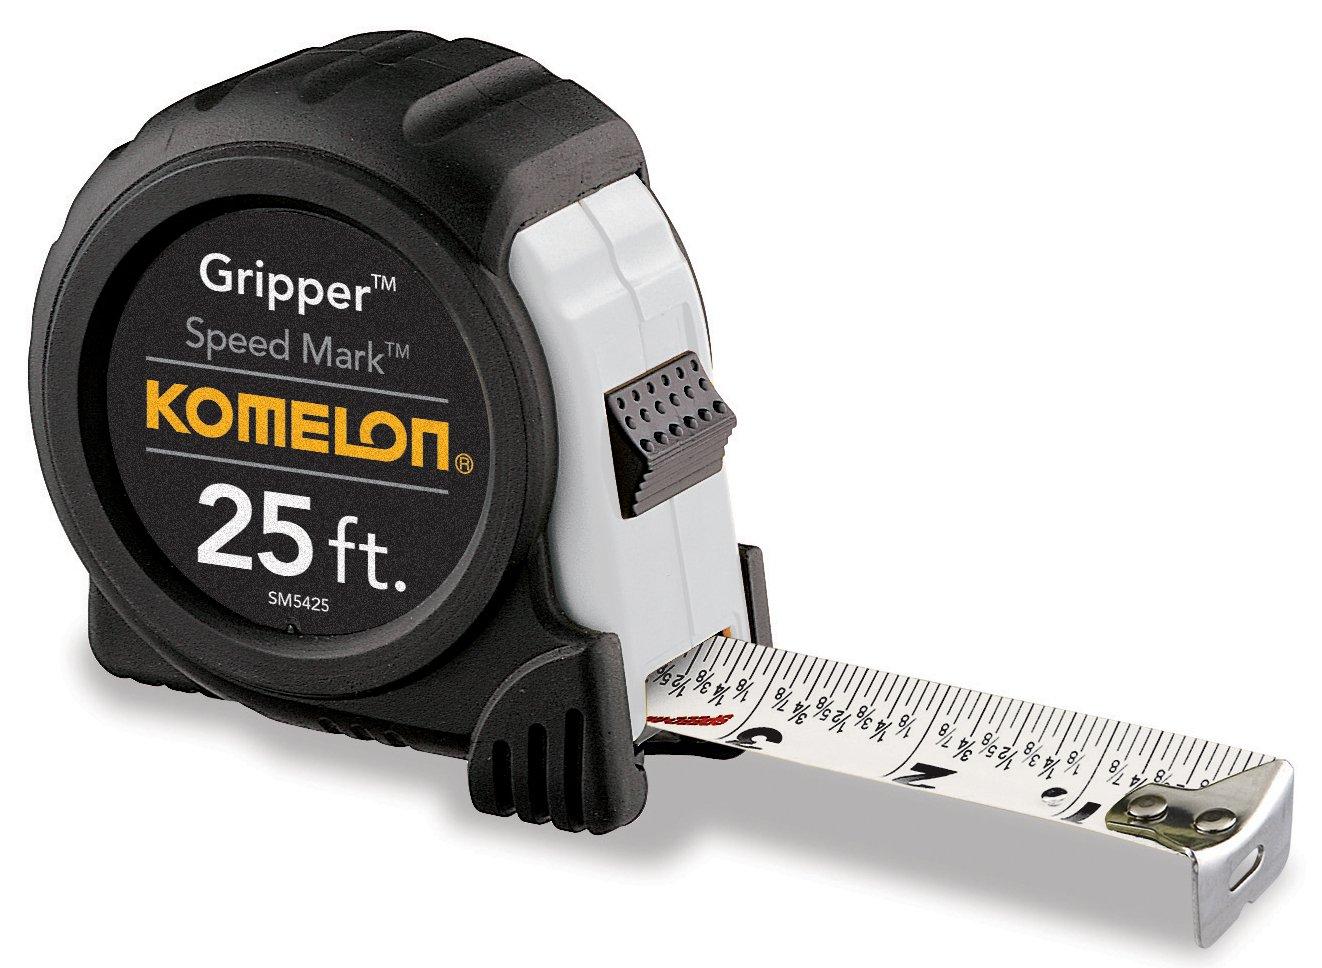 Komelon SM5425 Gripper Acrylic Measuring